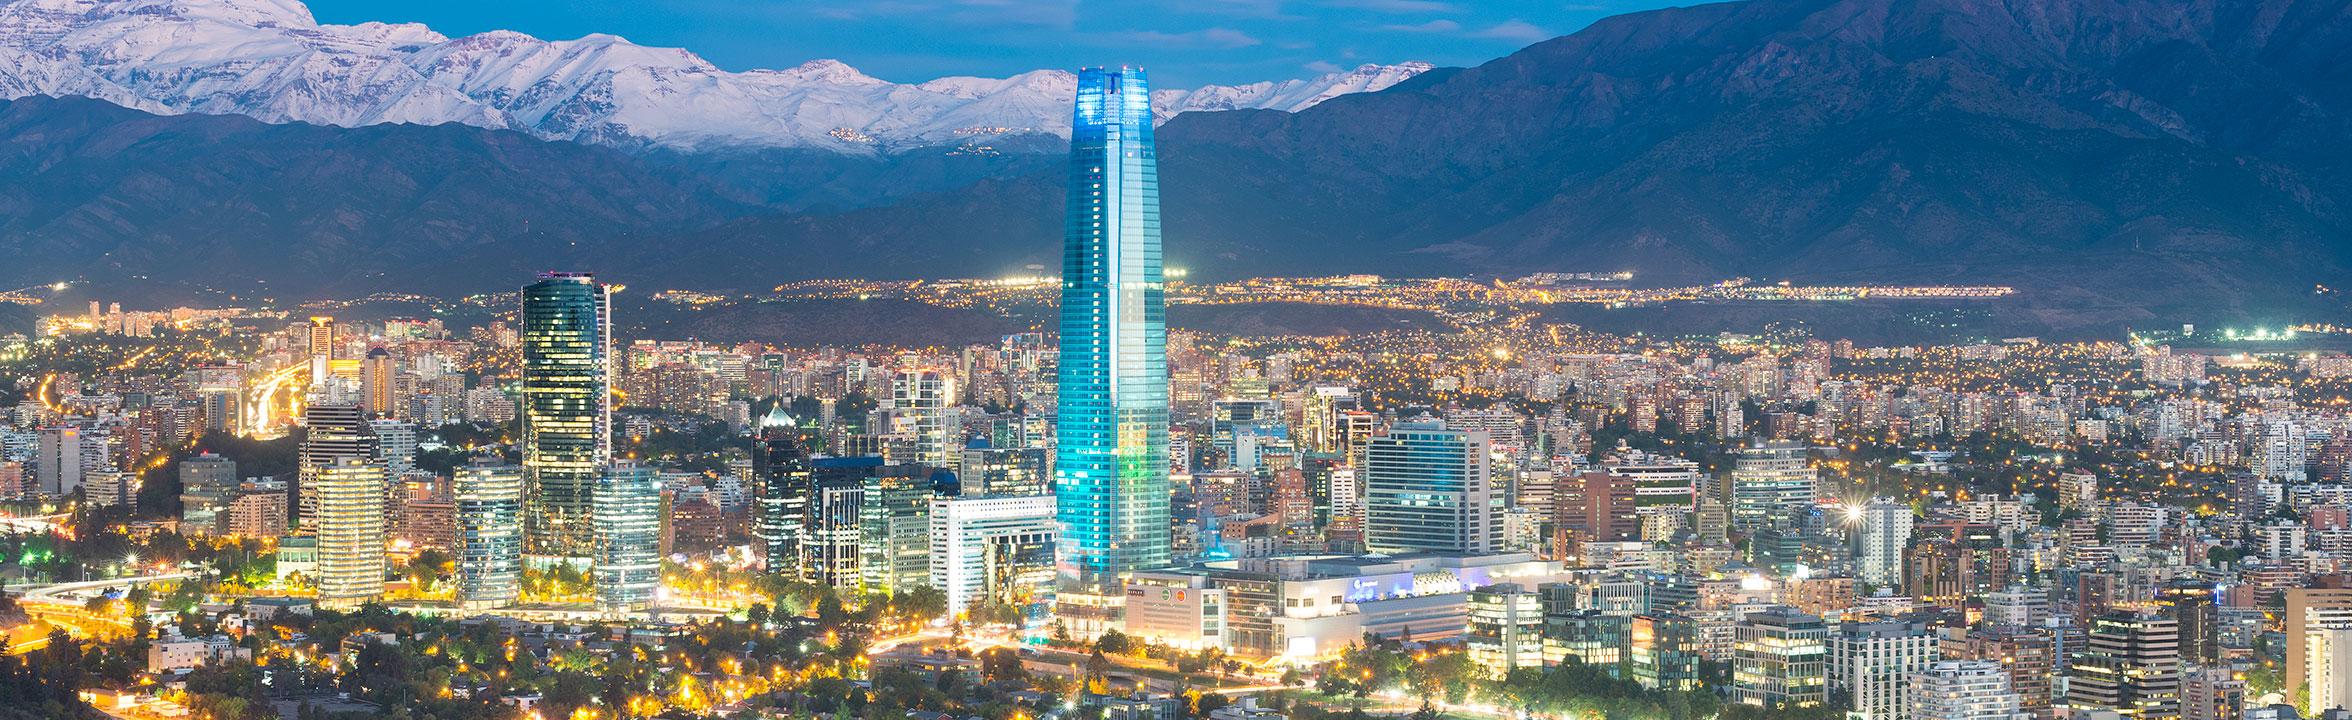 Santiago, Chile skyline